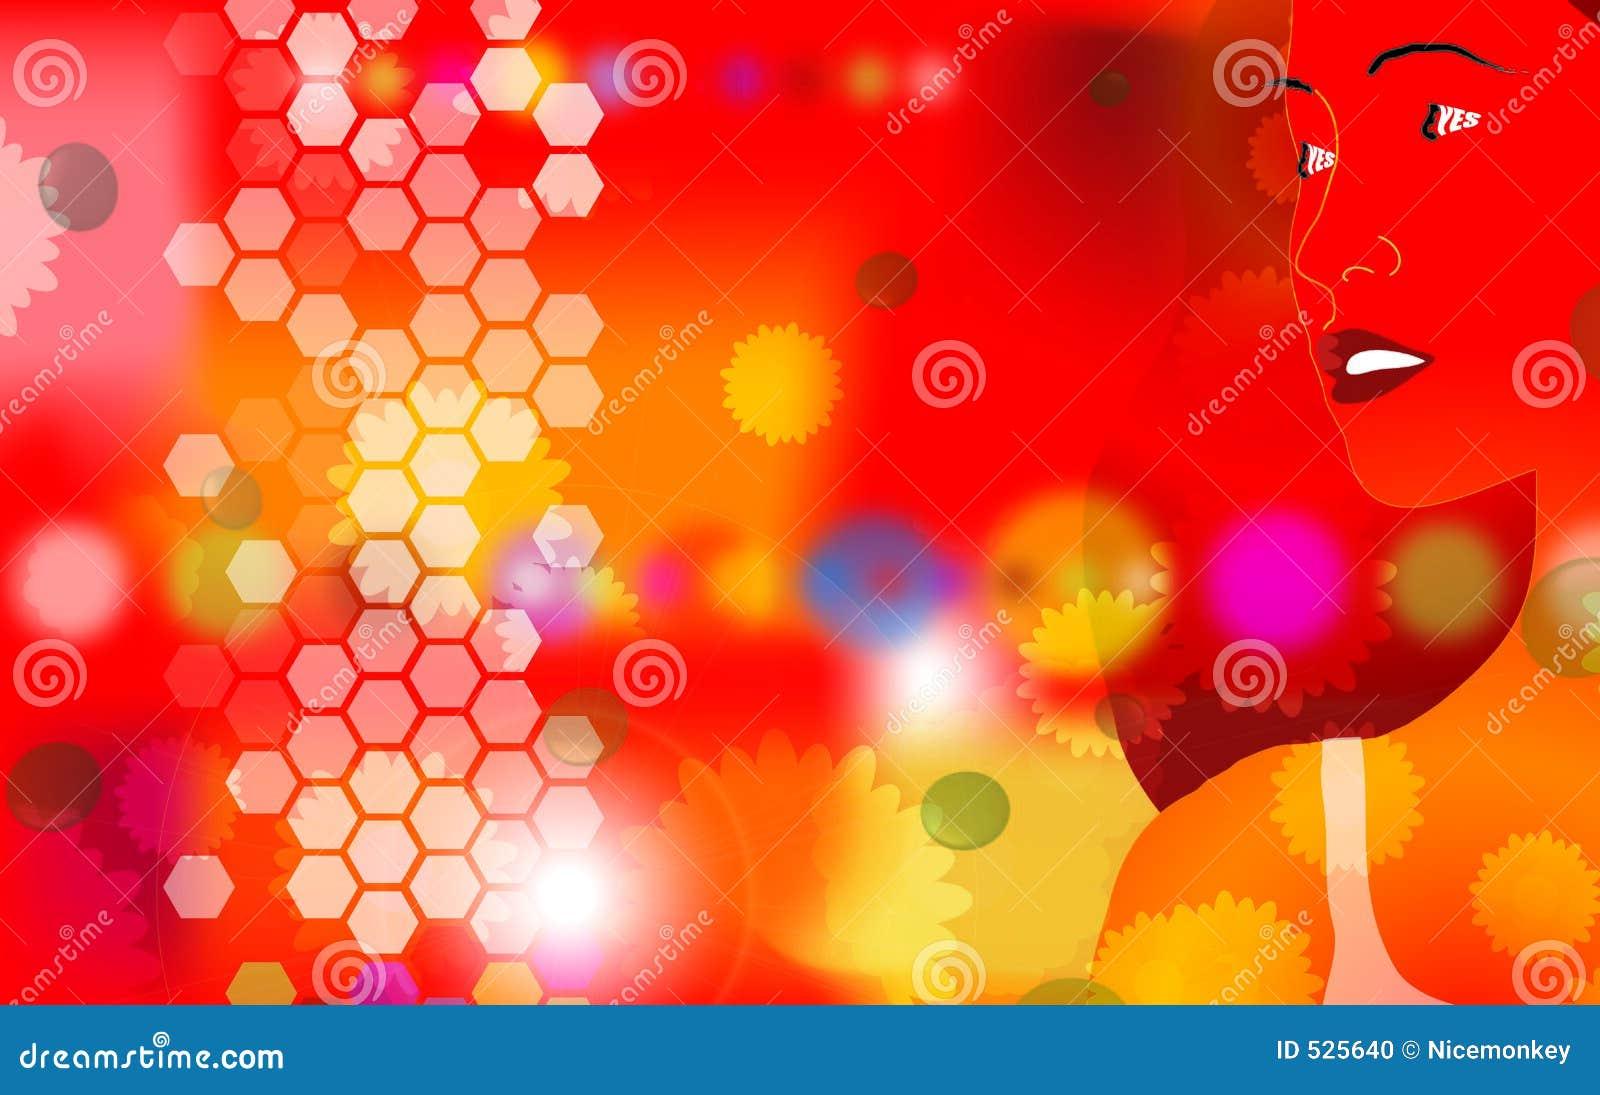 Download 2导致红色 库存例证. 插画 包括有 嘴唇, 蓝色, 爱好健美者, 六角形, 游泳, 介绍, 激情, 形状, 表面 - 525640